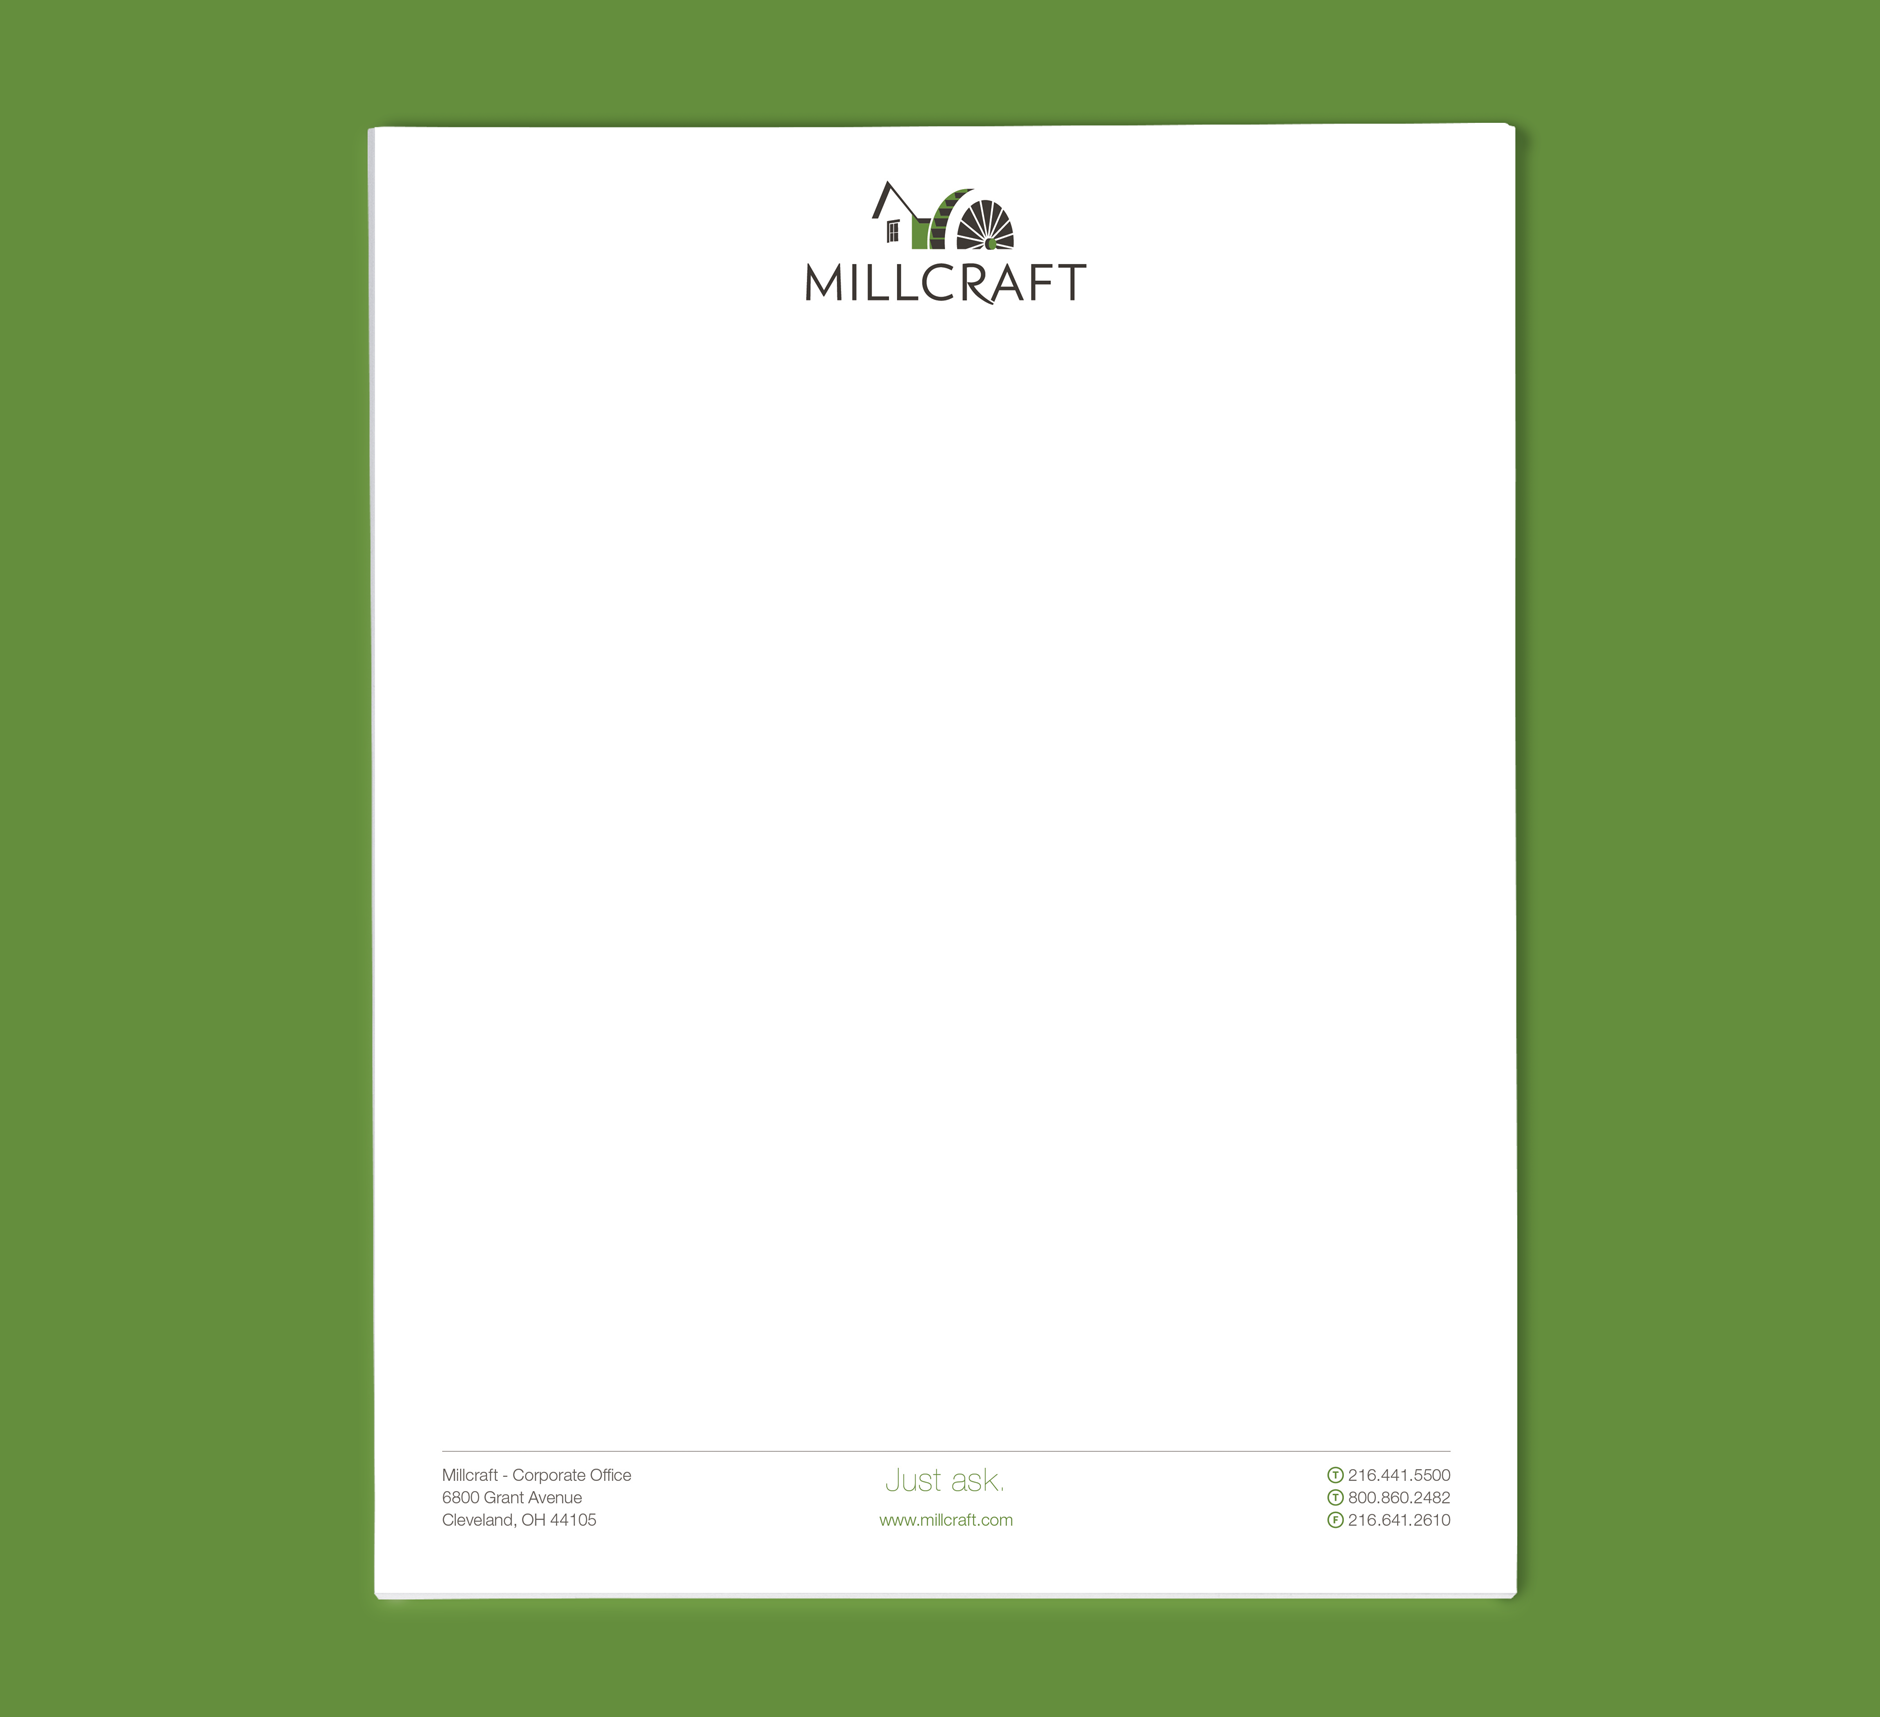 Millcraft Logo Branding | Company Rebranding